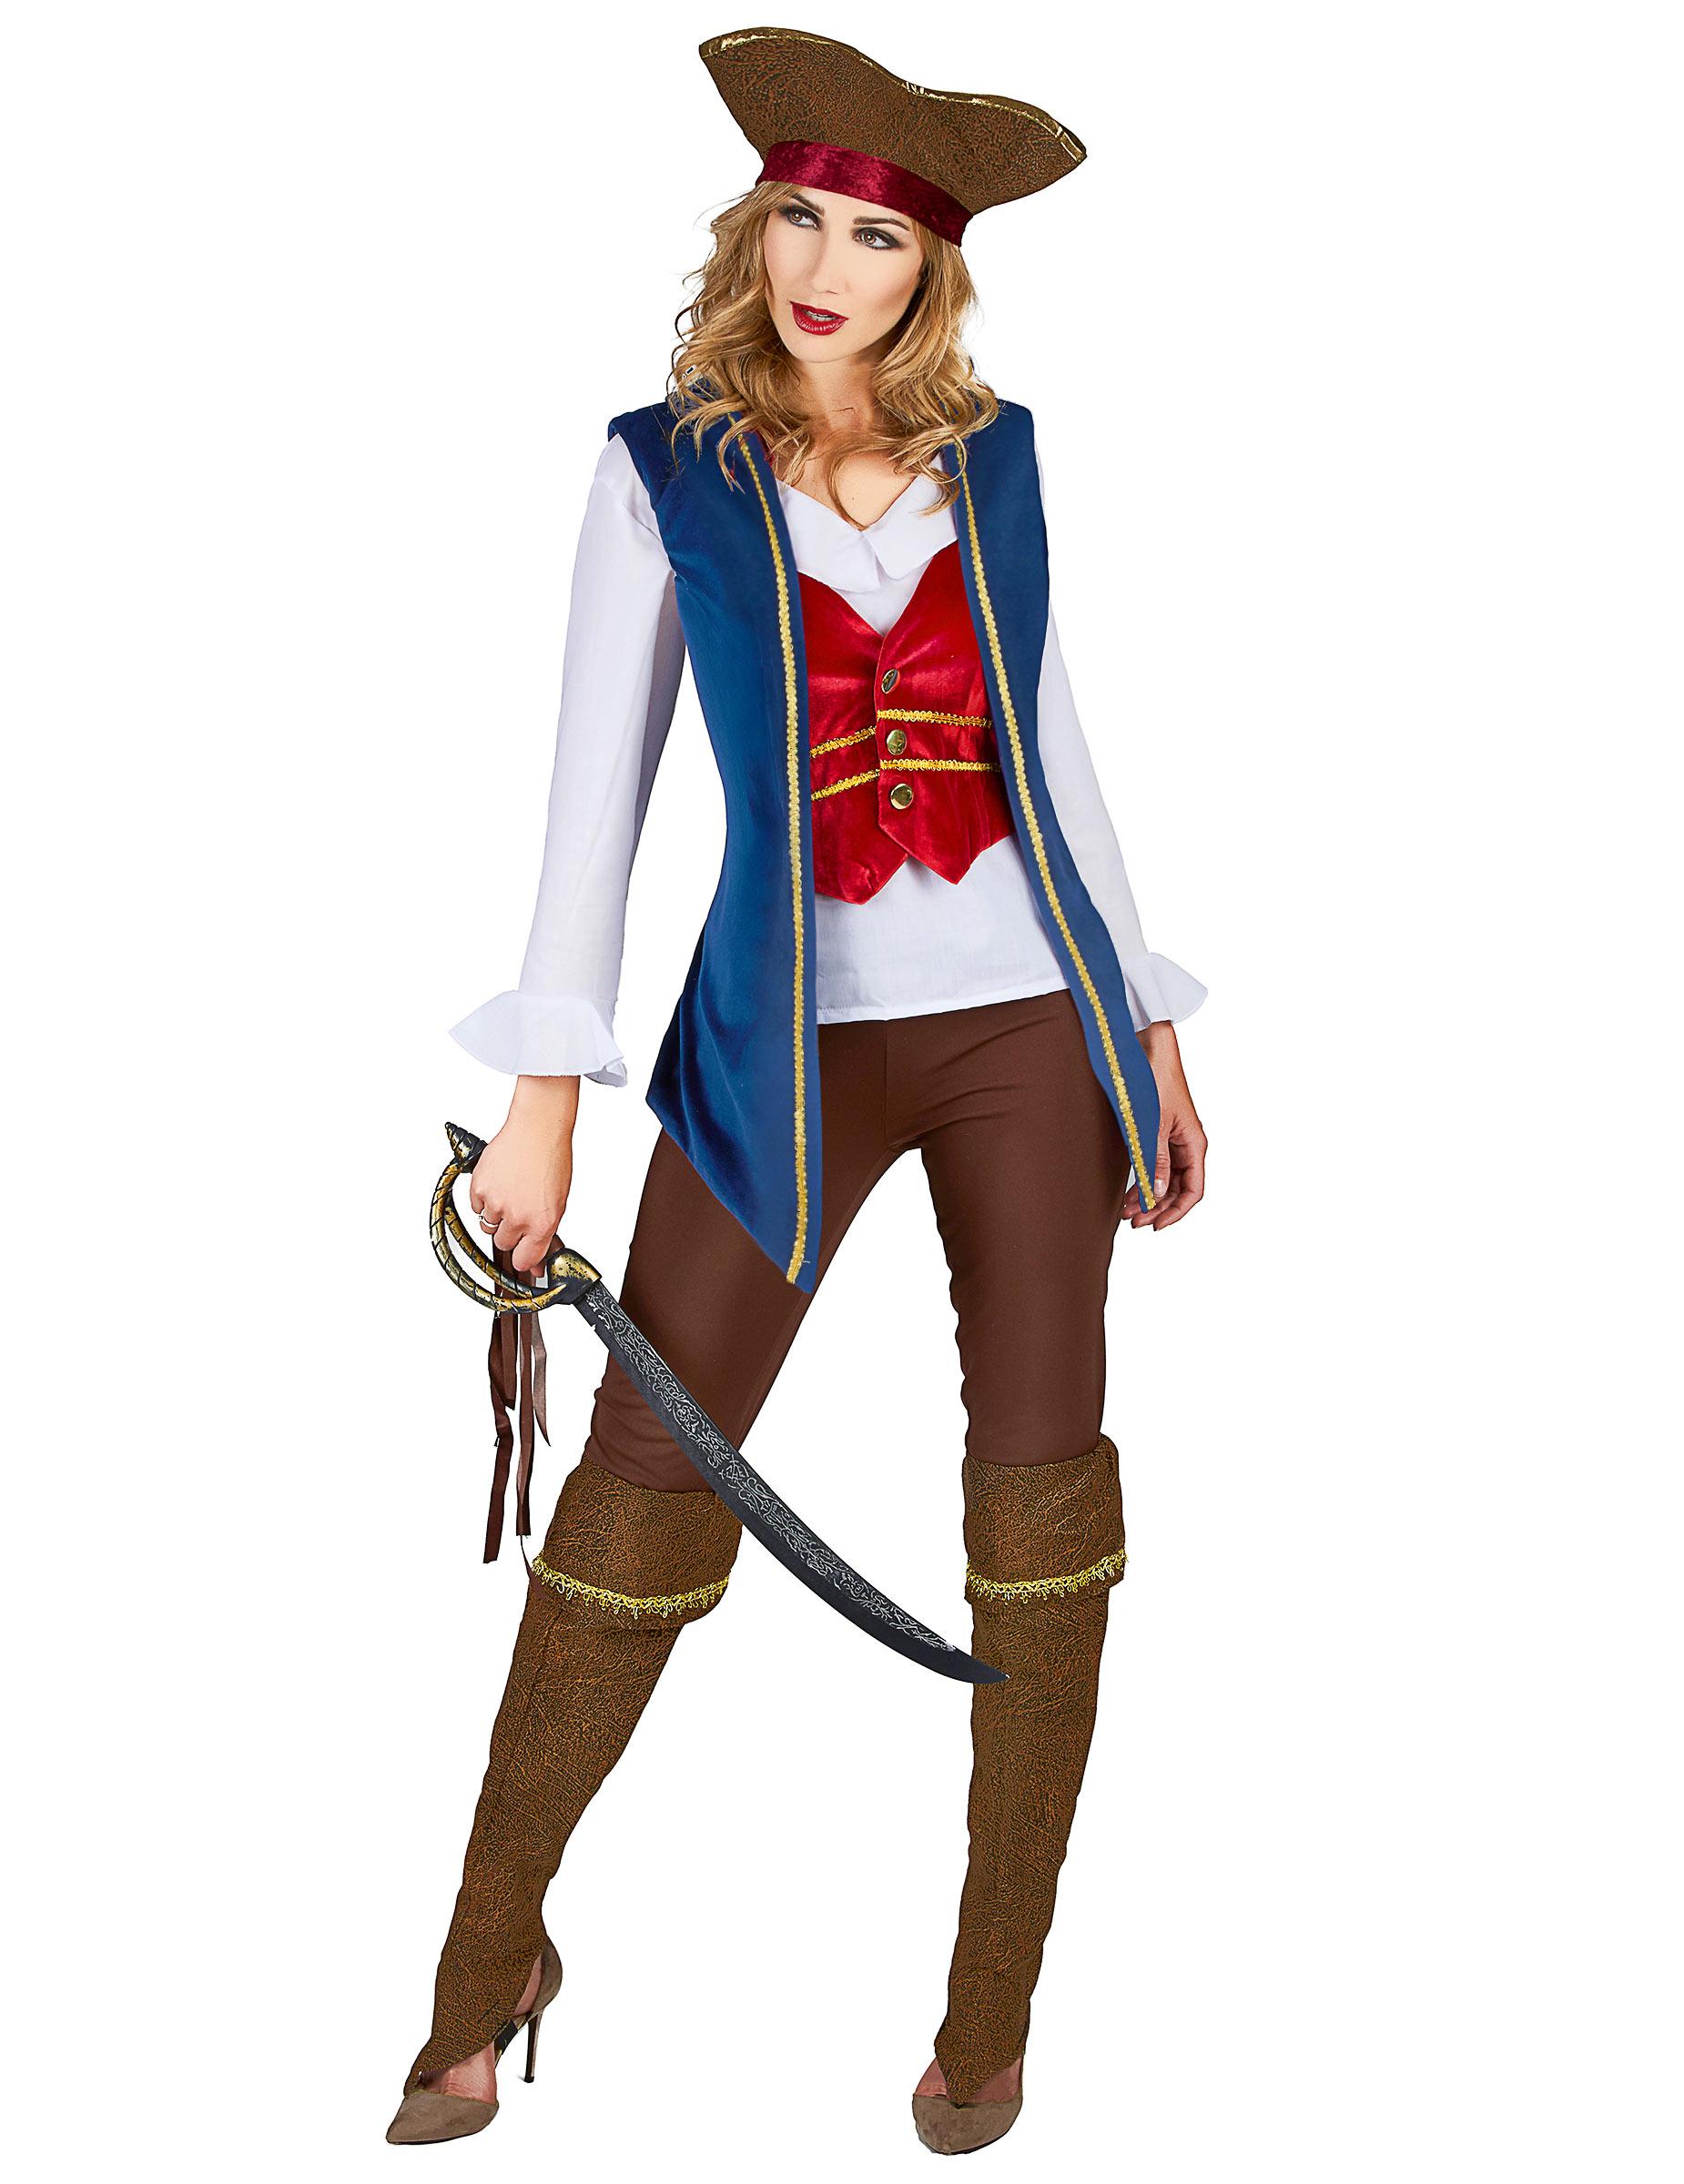 Ben noto Costume da pirata blu e prugna da donna: Costumi adulti,e vestiti  GS87